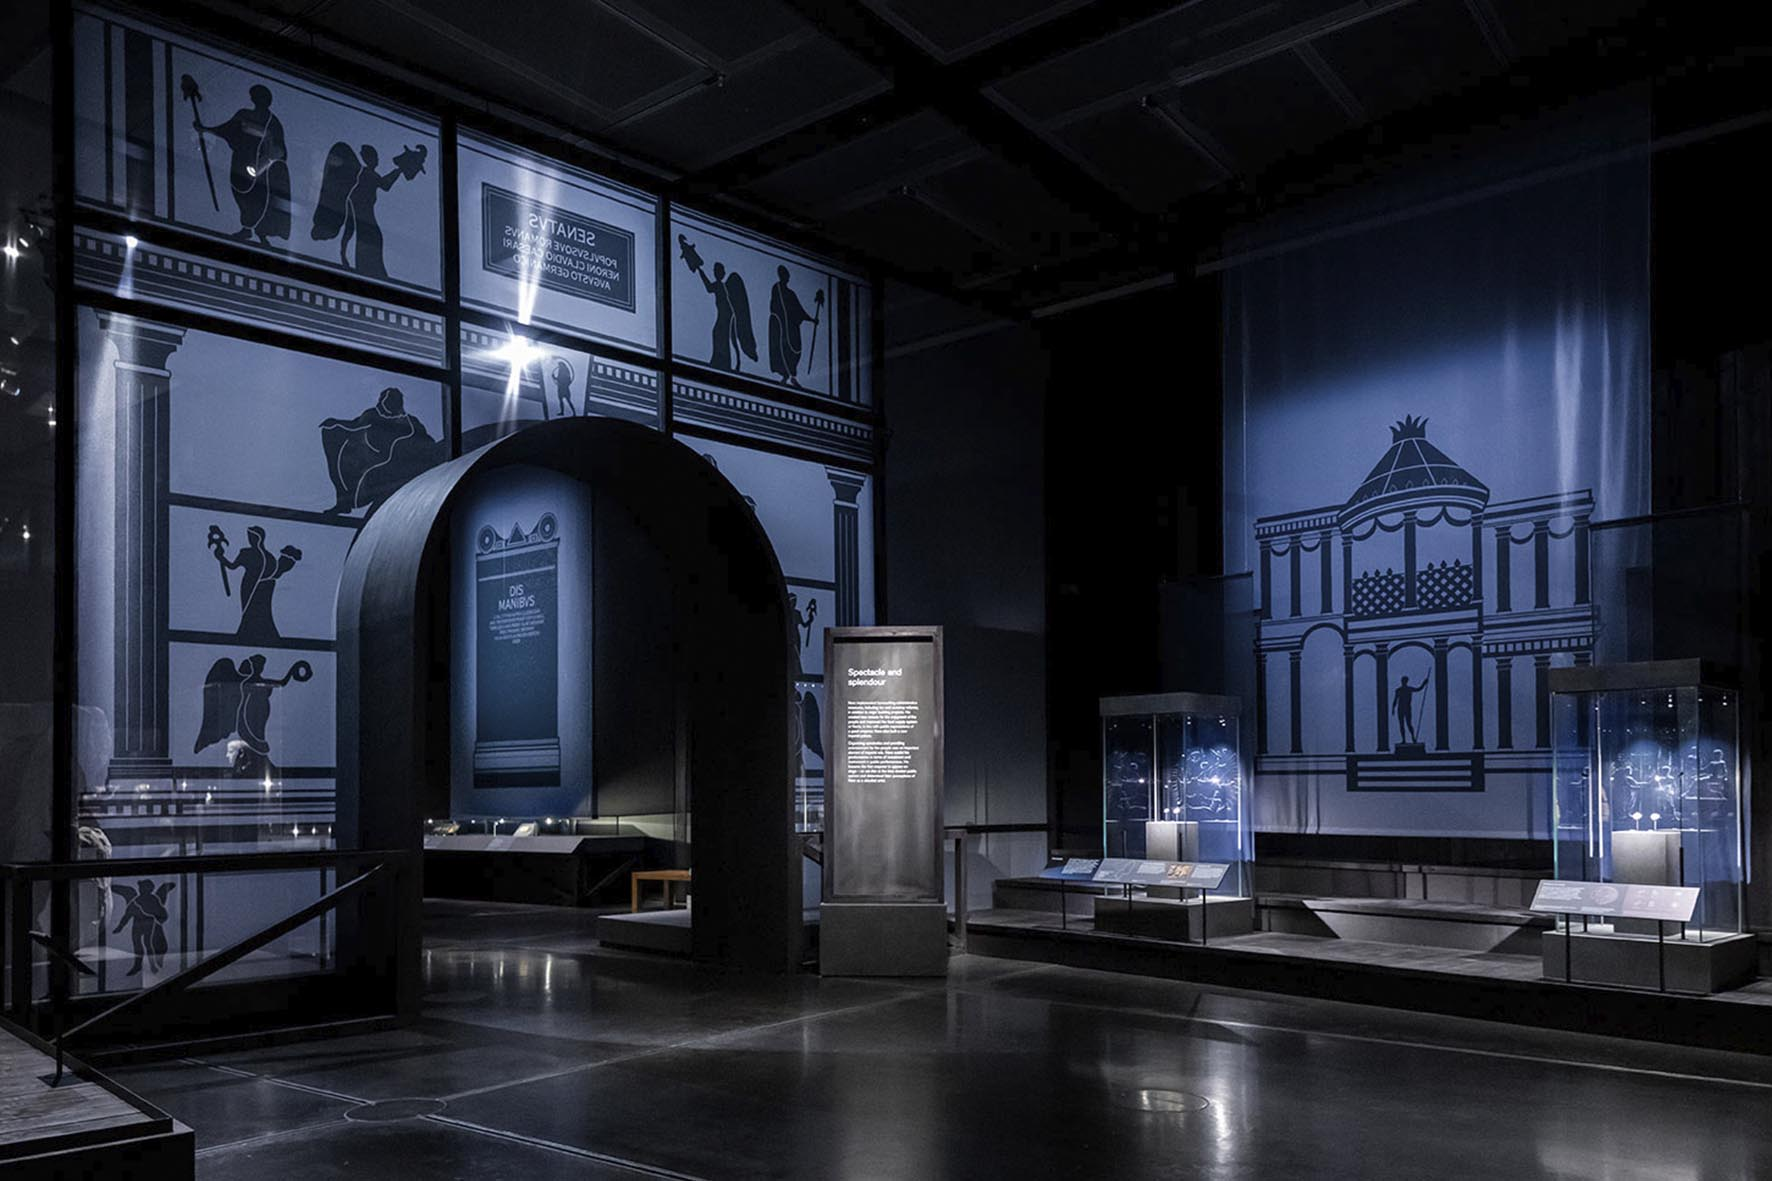 drinkalldean_lombaertstudio_britishmuseum_nero_15